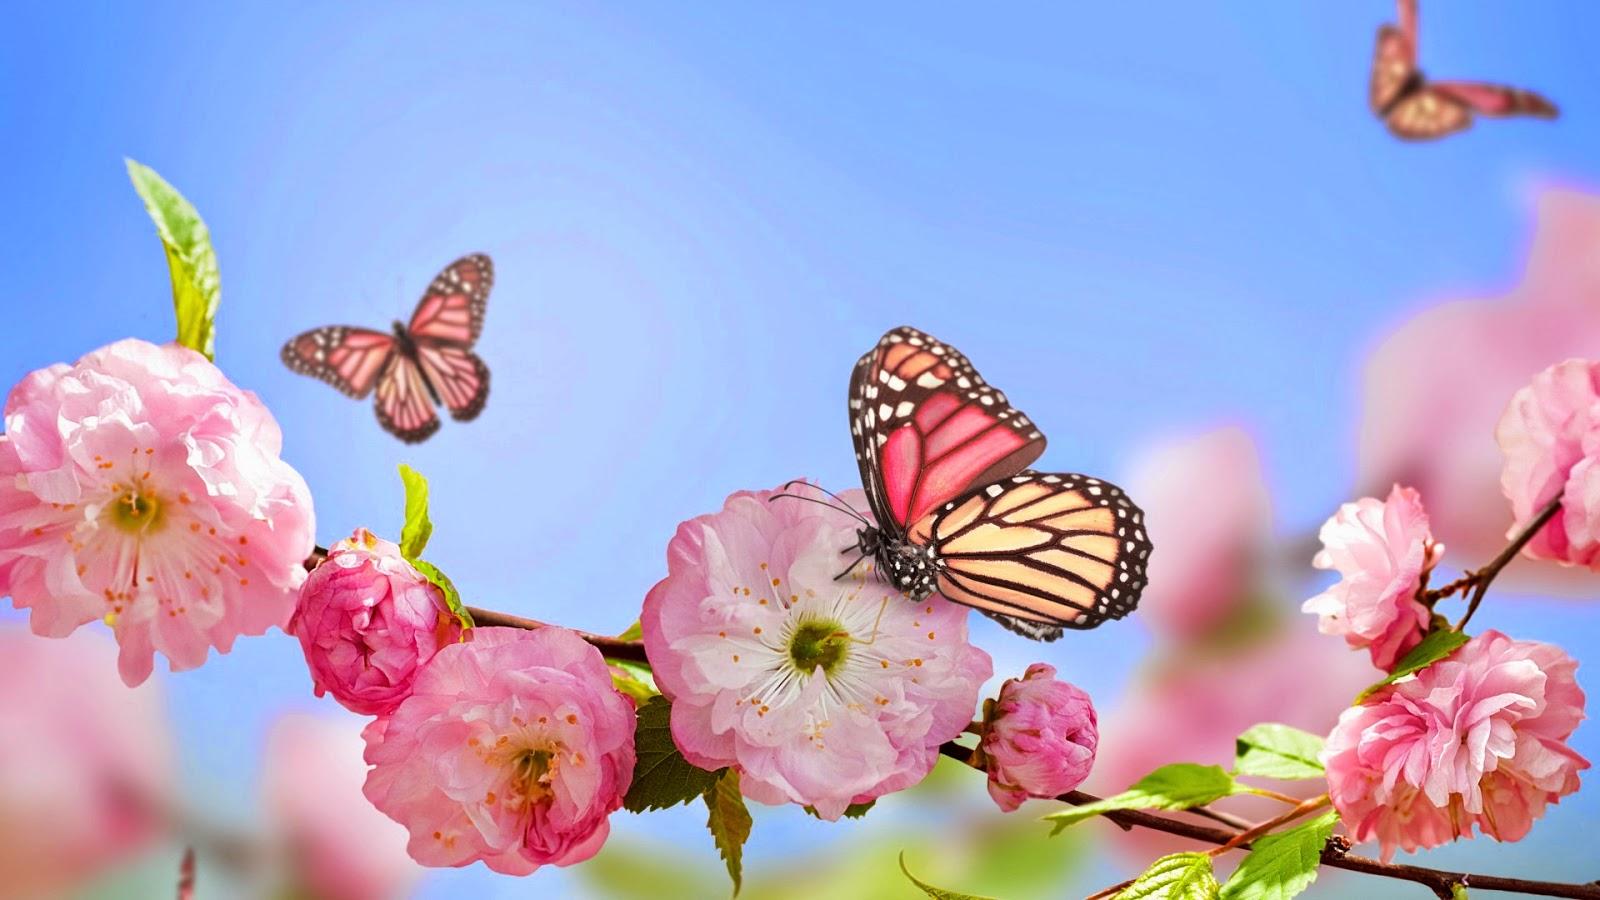 Image gallery hermosas flores con mariposas - Rosas rosas hermosas ...